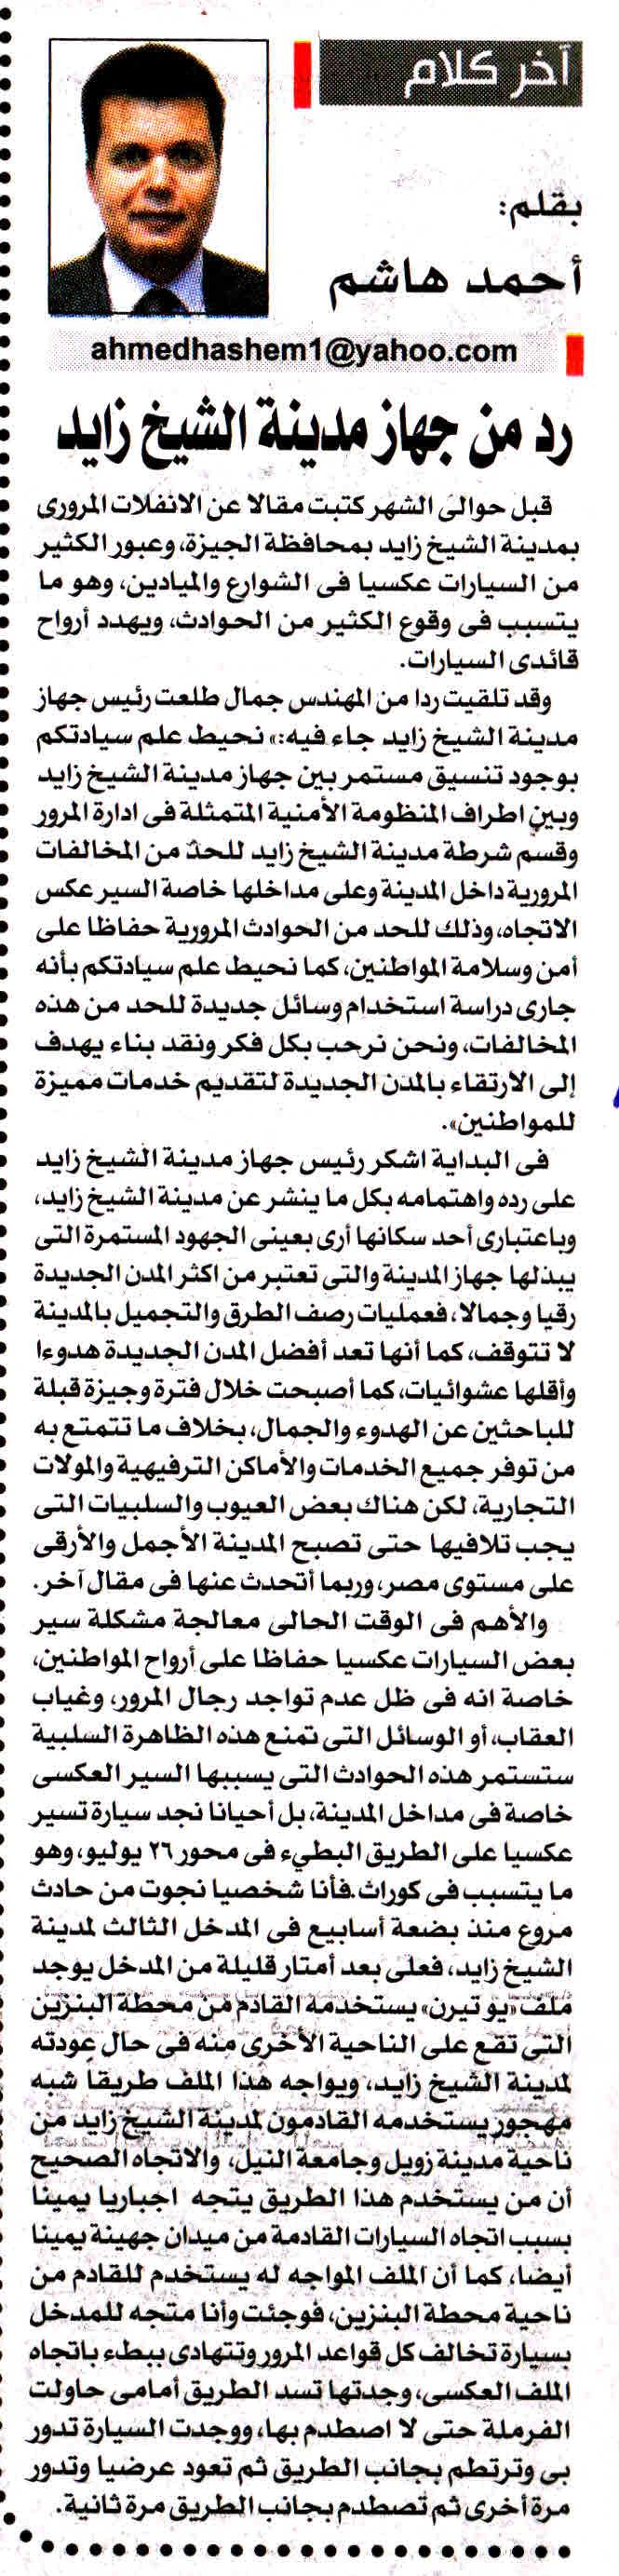 Akhbar Al Youm 11 Nov P.18.jpg